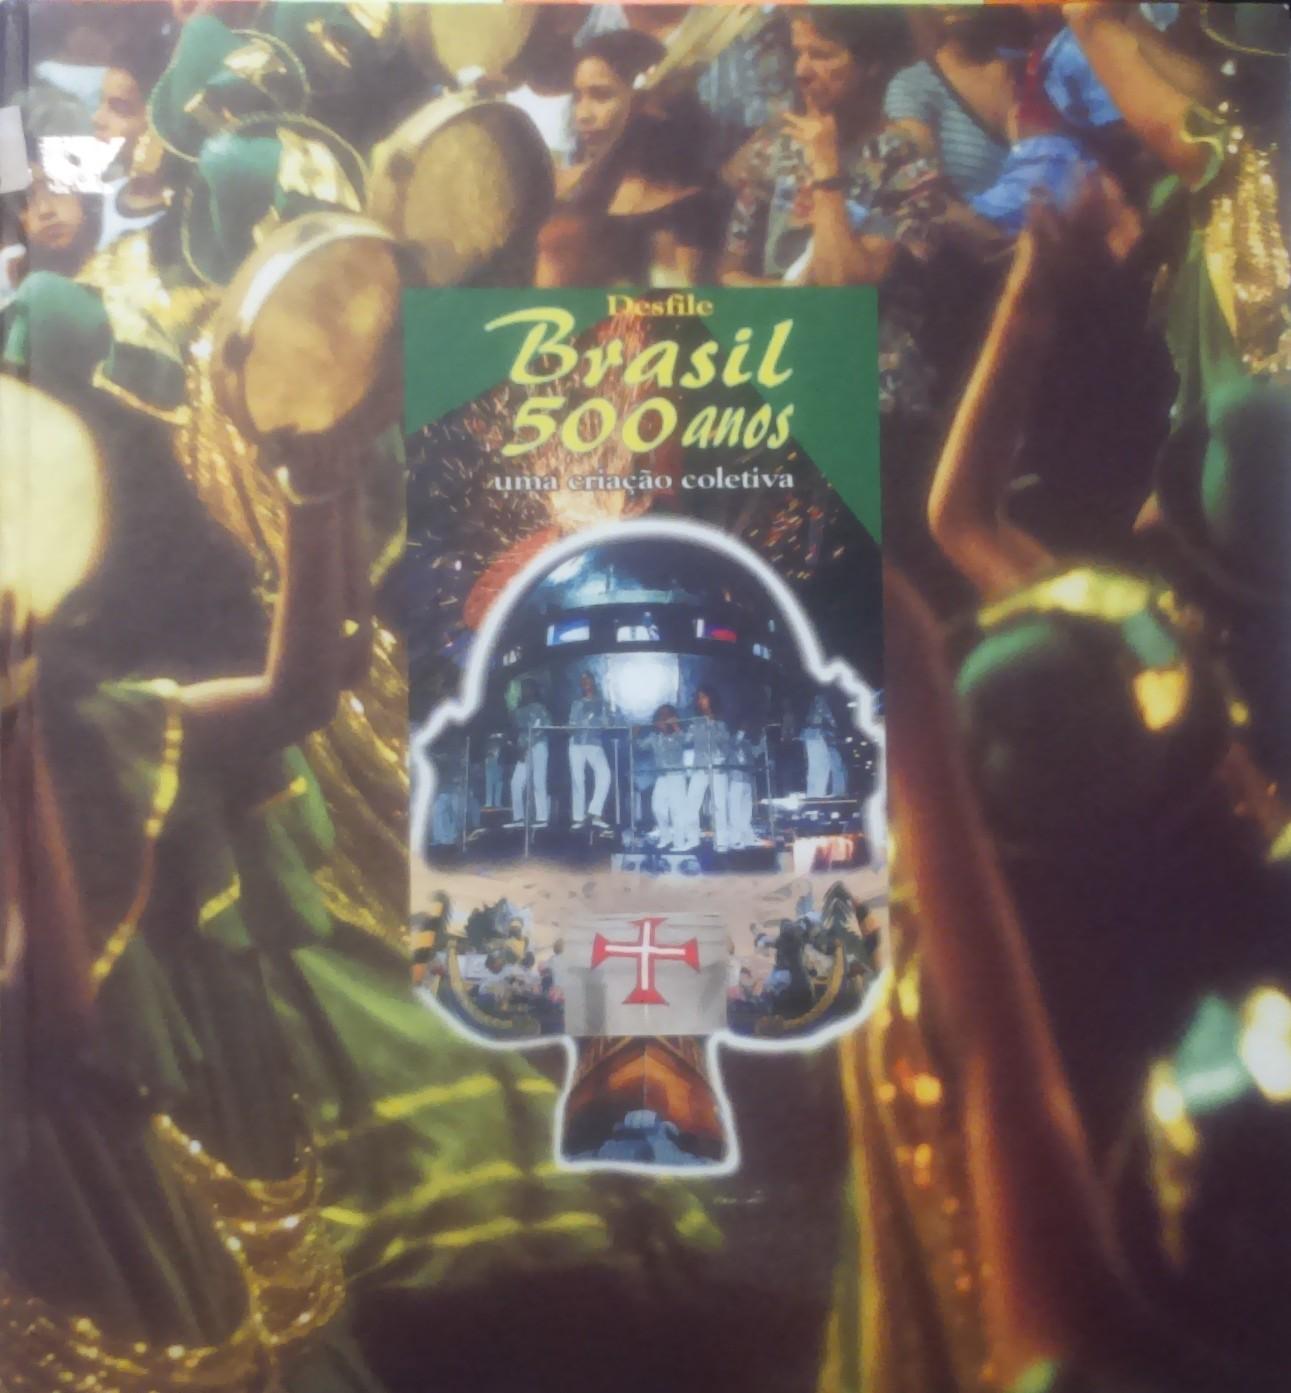 capa livro desfile brasil 500 anos